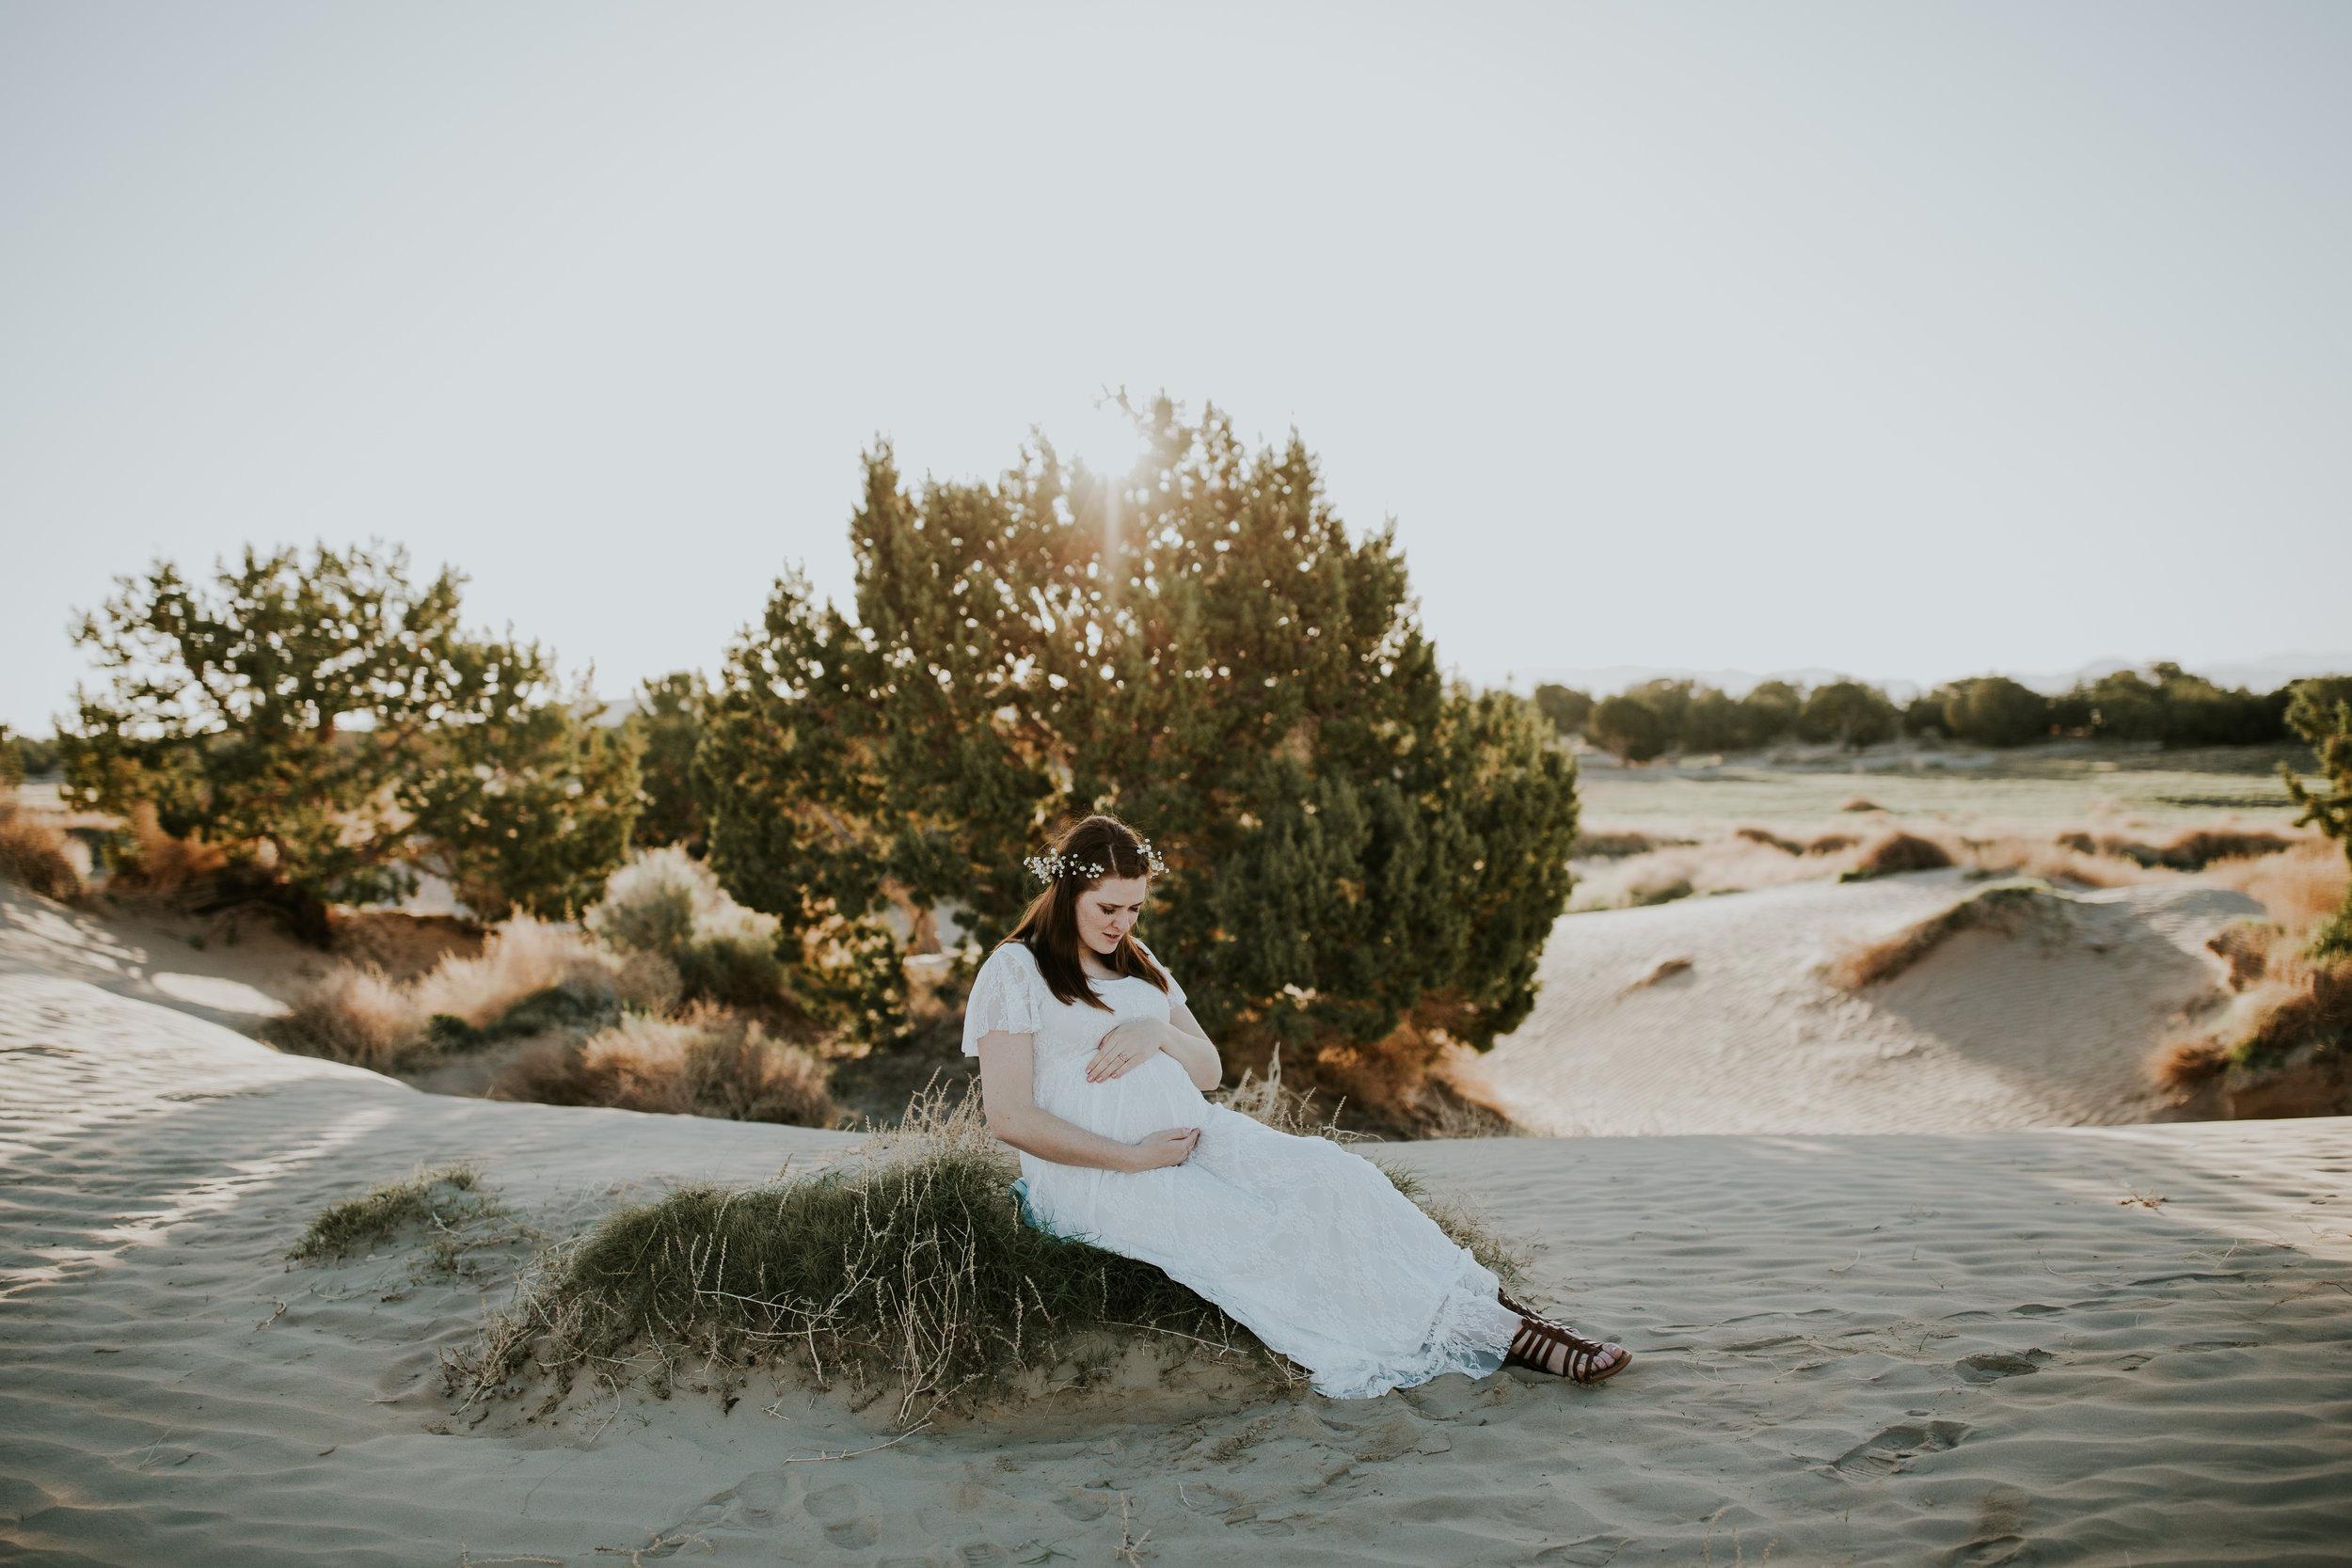 Evans GA maternity photographer